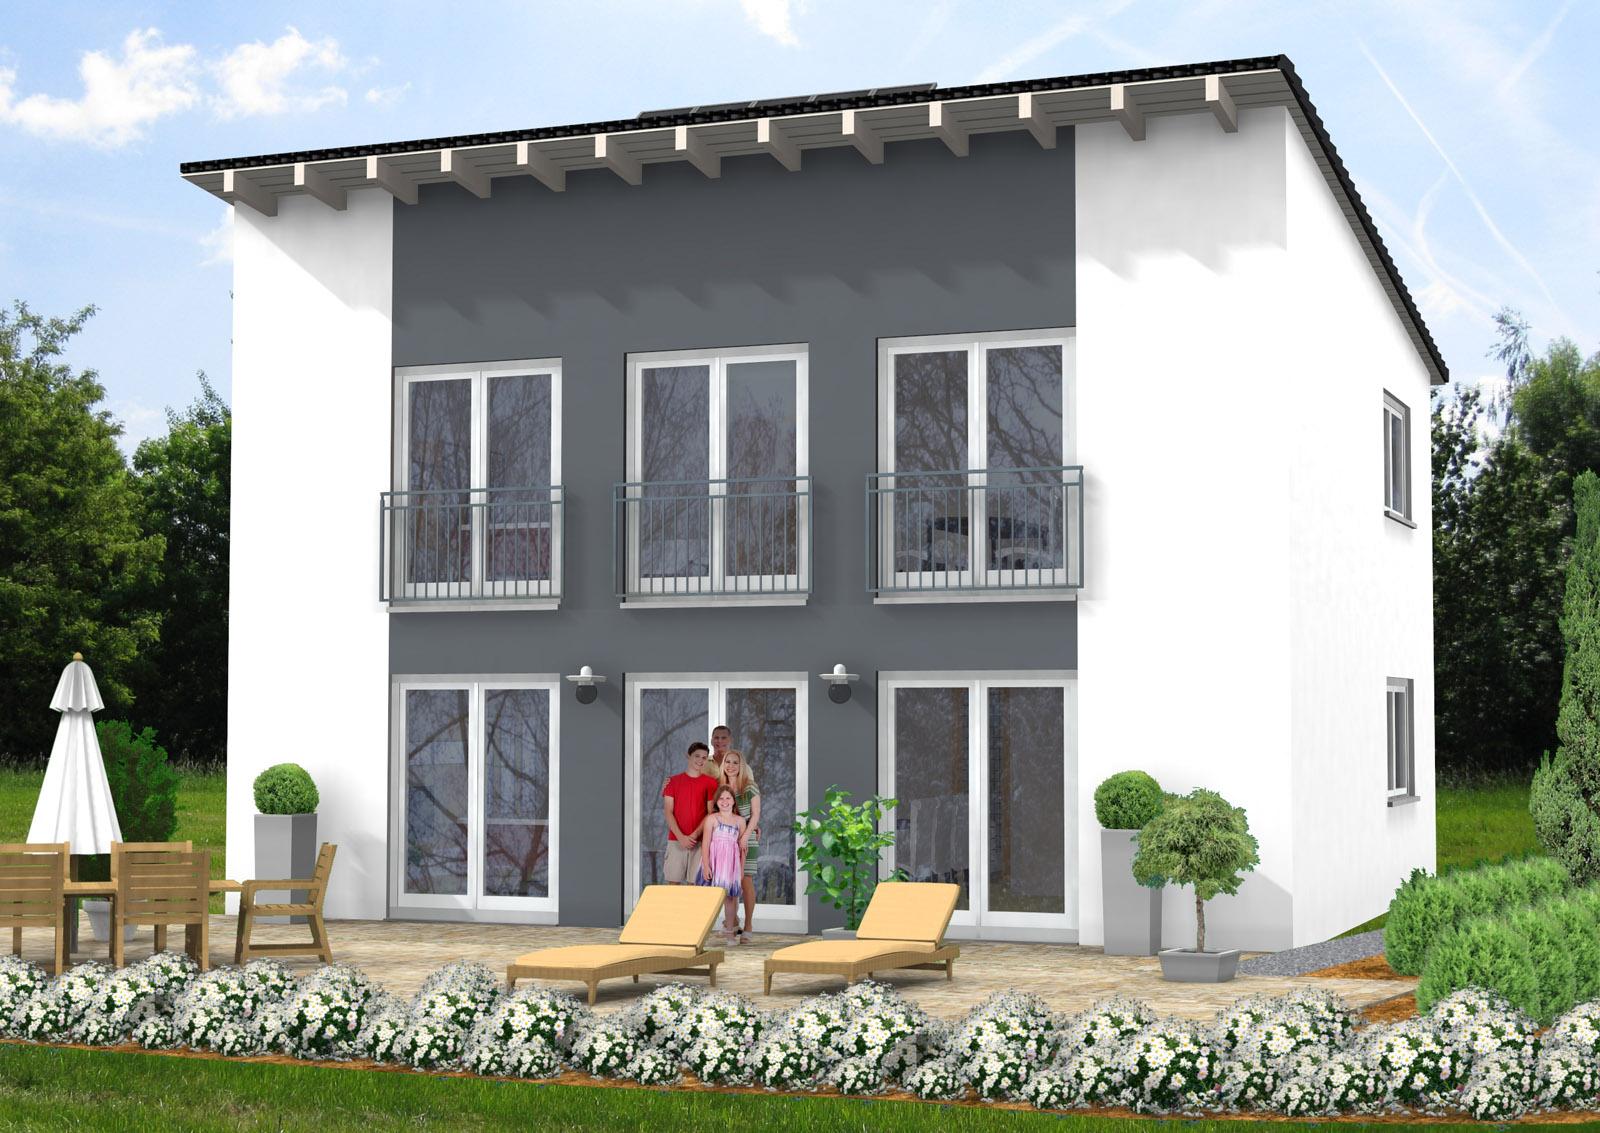 bauberatung baubetreuung baufinanzierung bauplanung pultdachhaus 122 m. Black Bedroom Furniture Sets. Home Design Ideas